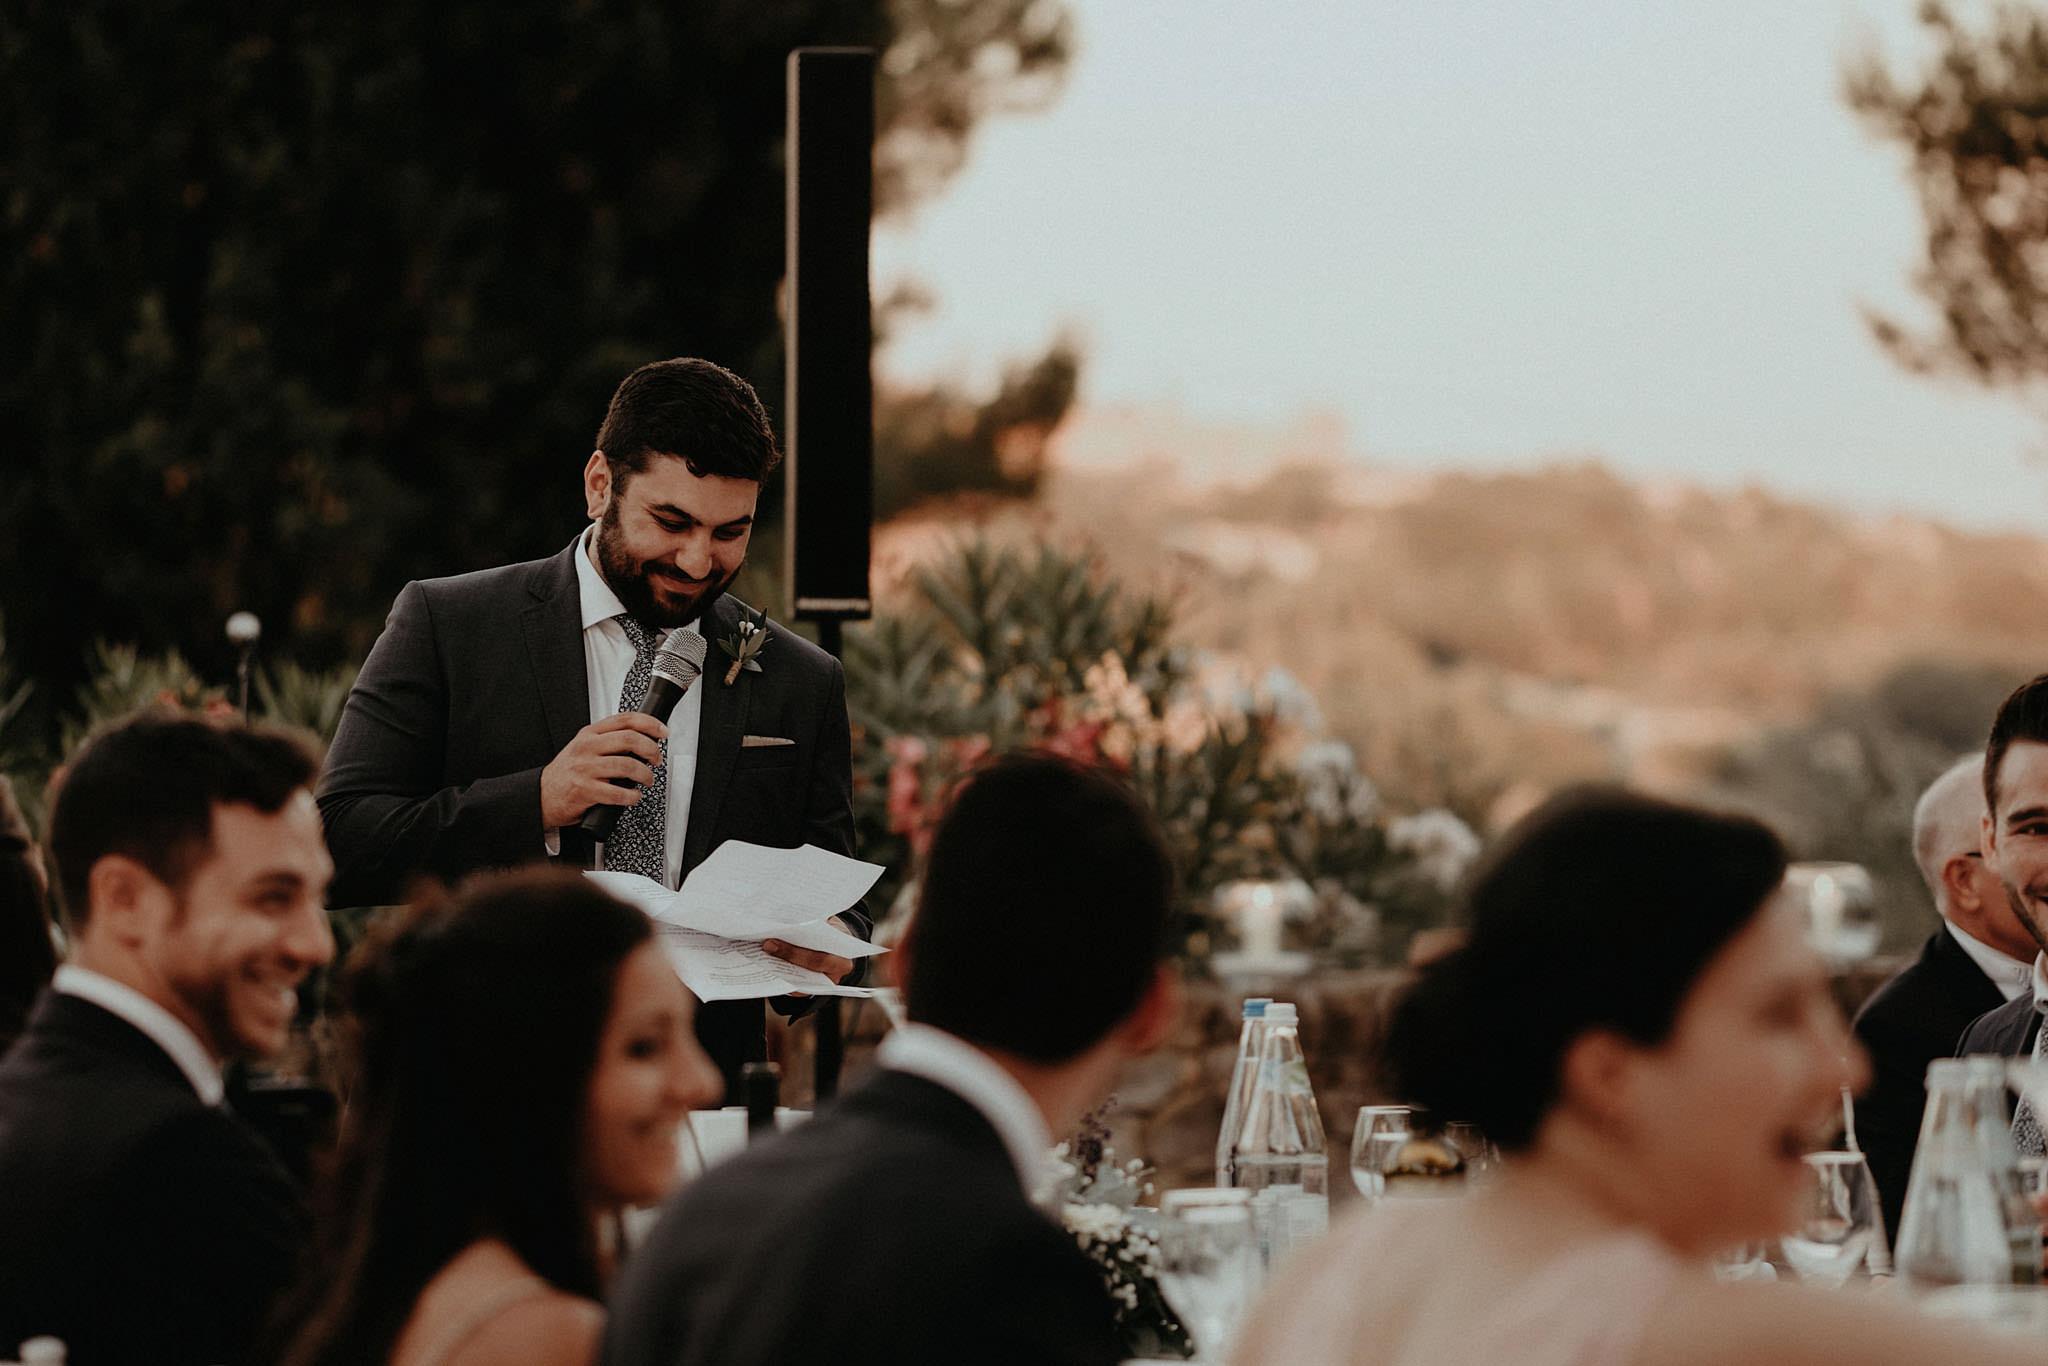 Max-Steph-Italy-Wedding-597.jpg